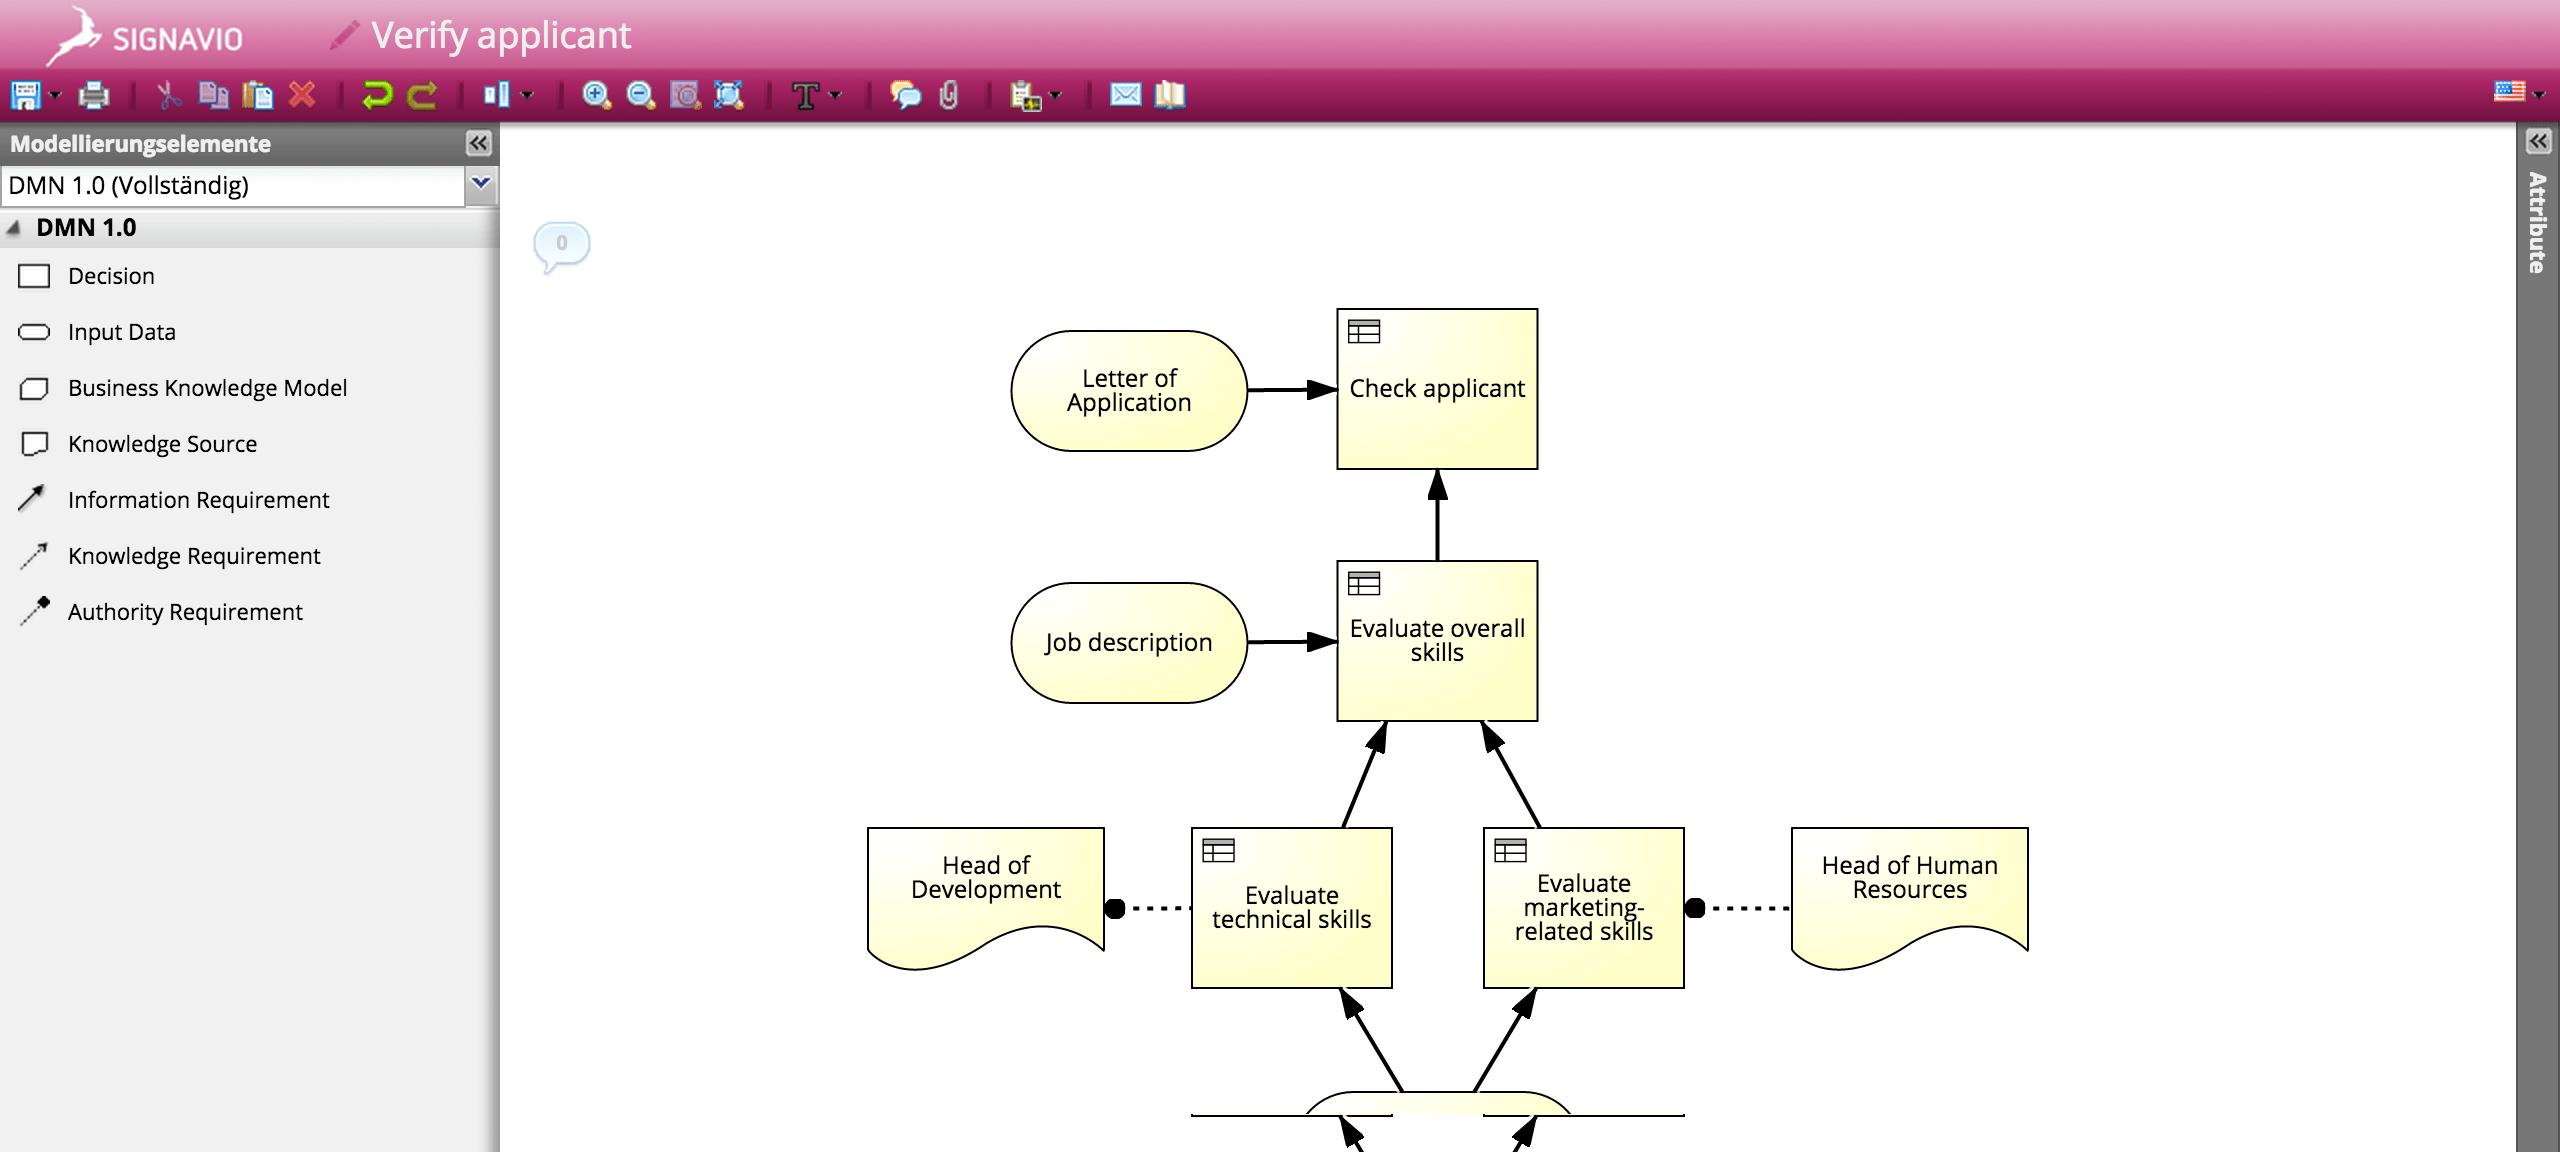 DMN Requirements Diagrams (DRD) -Signavio Decision Manager- Screenshot